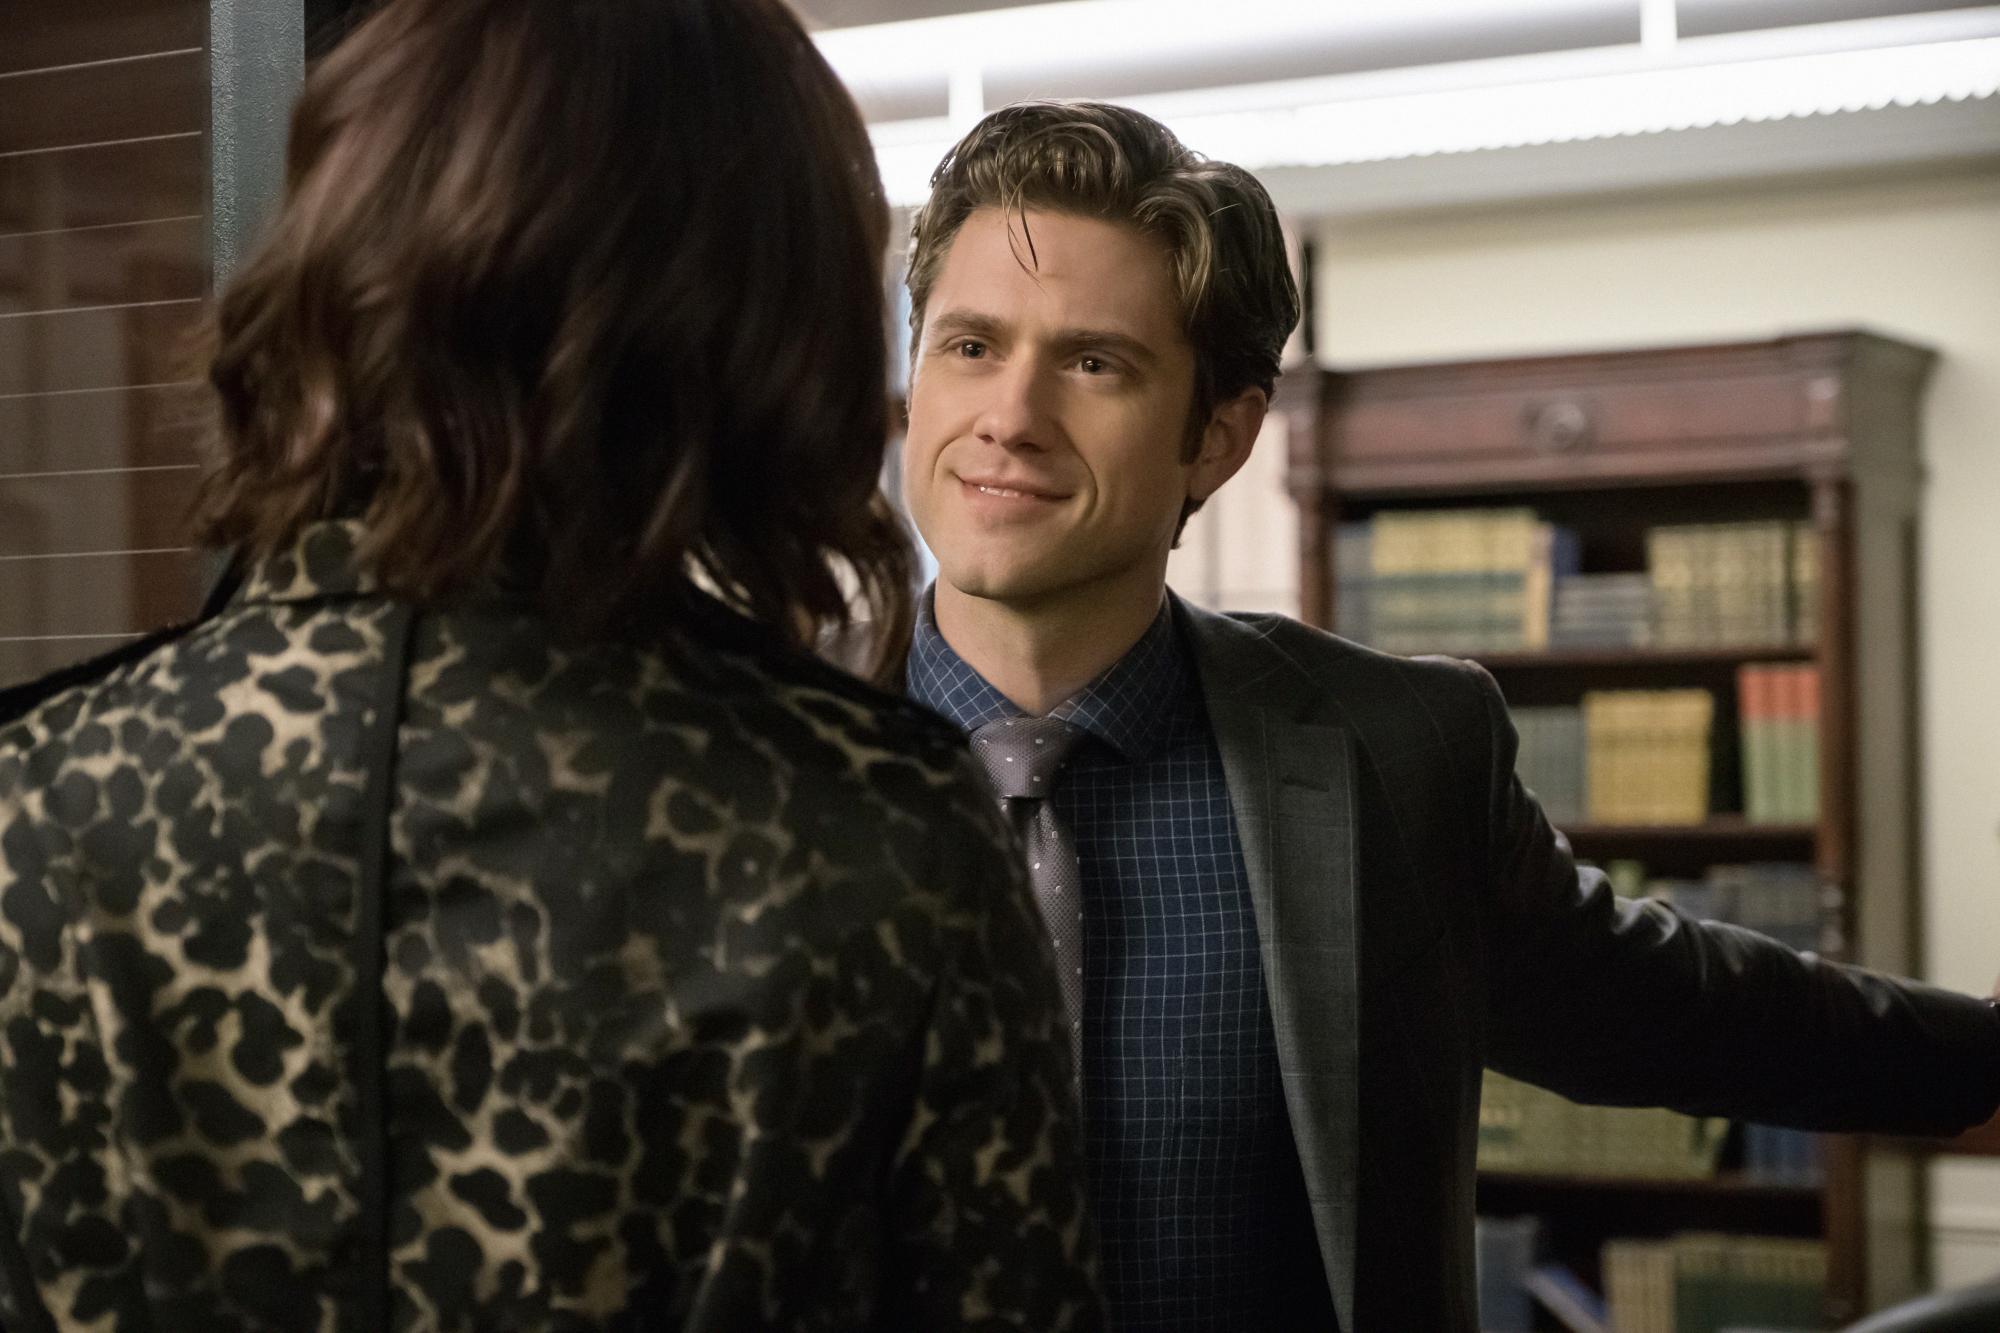 Laurel and Gareth meet in Senator Wheatus' office.